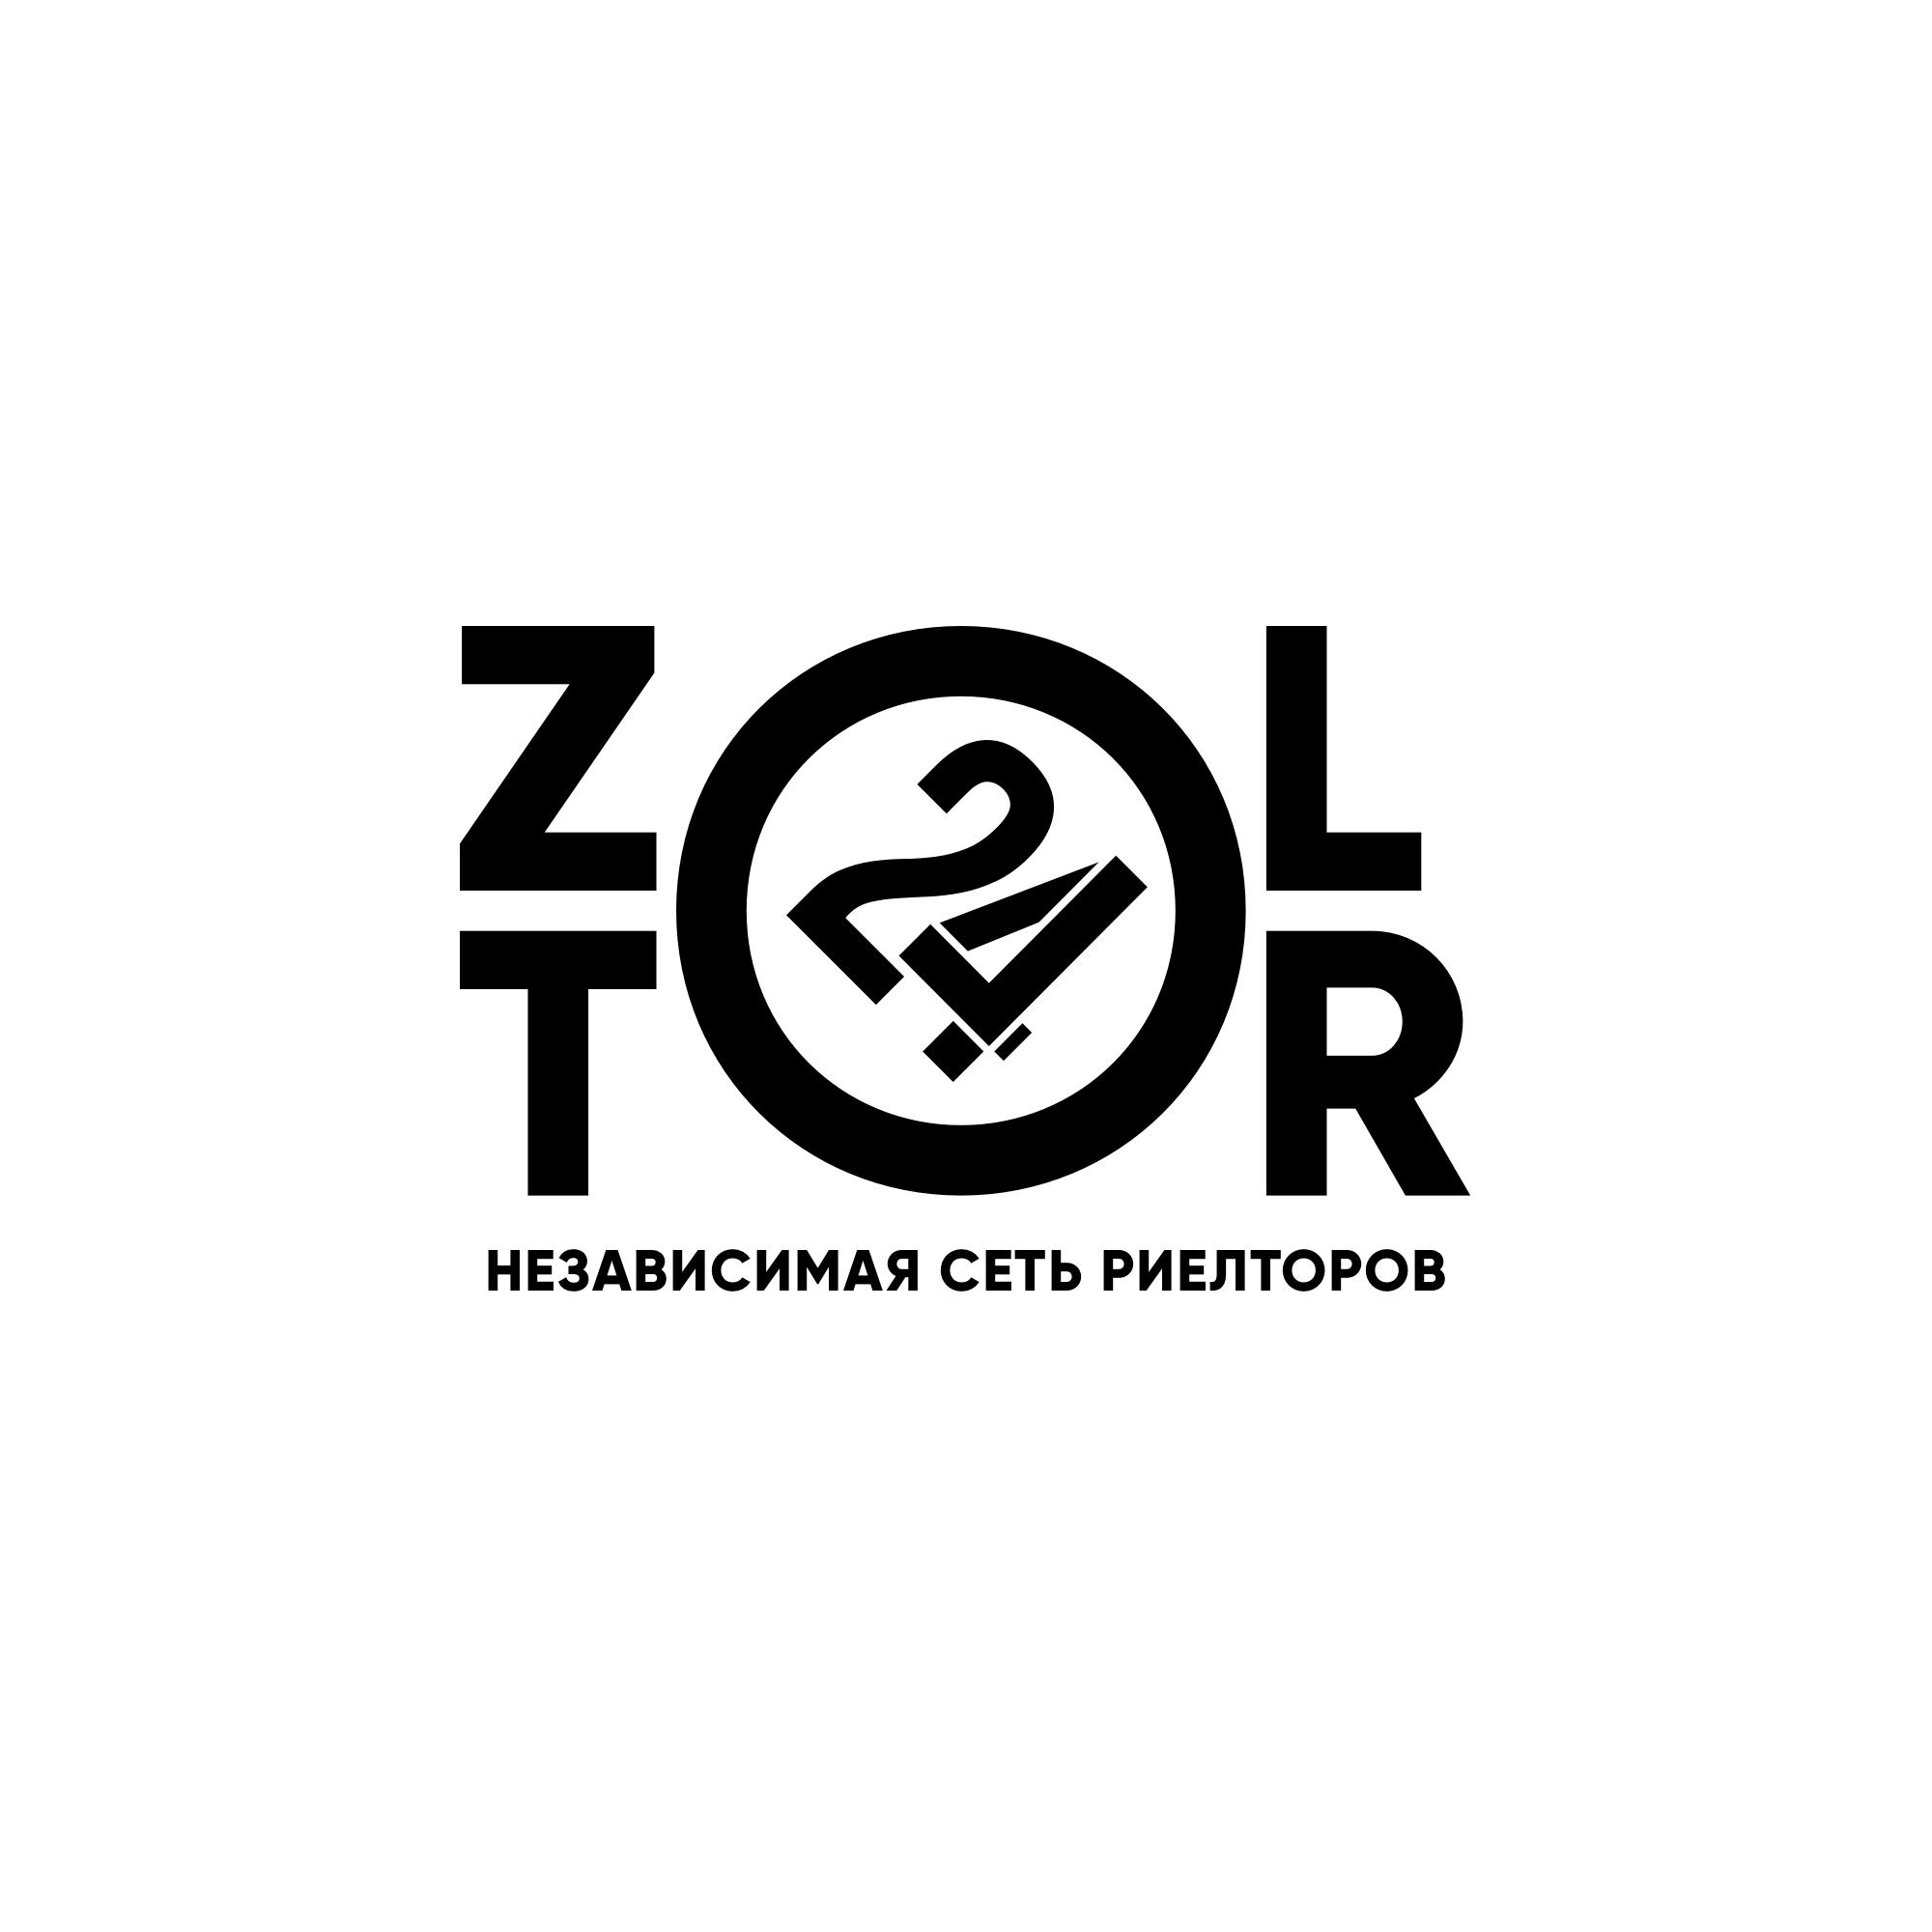 Логотип и фирменный стиль ZolTor24 фото f_8425c8bf58d96301.jpg